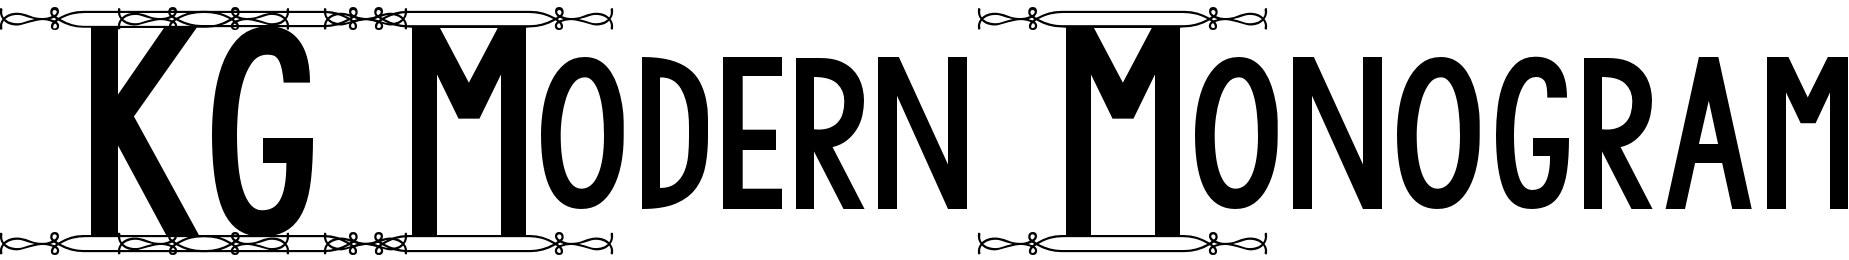 KG Modern Monogram